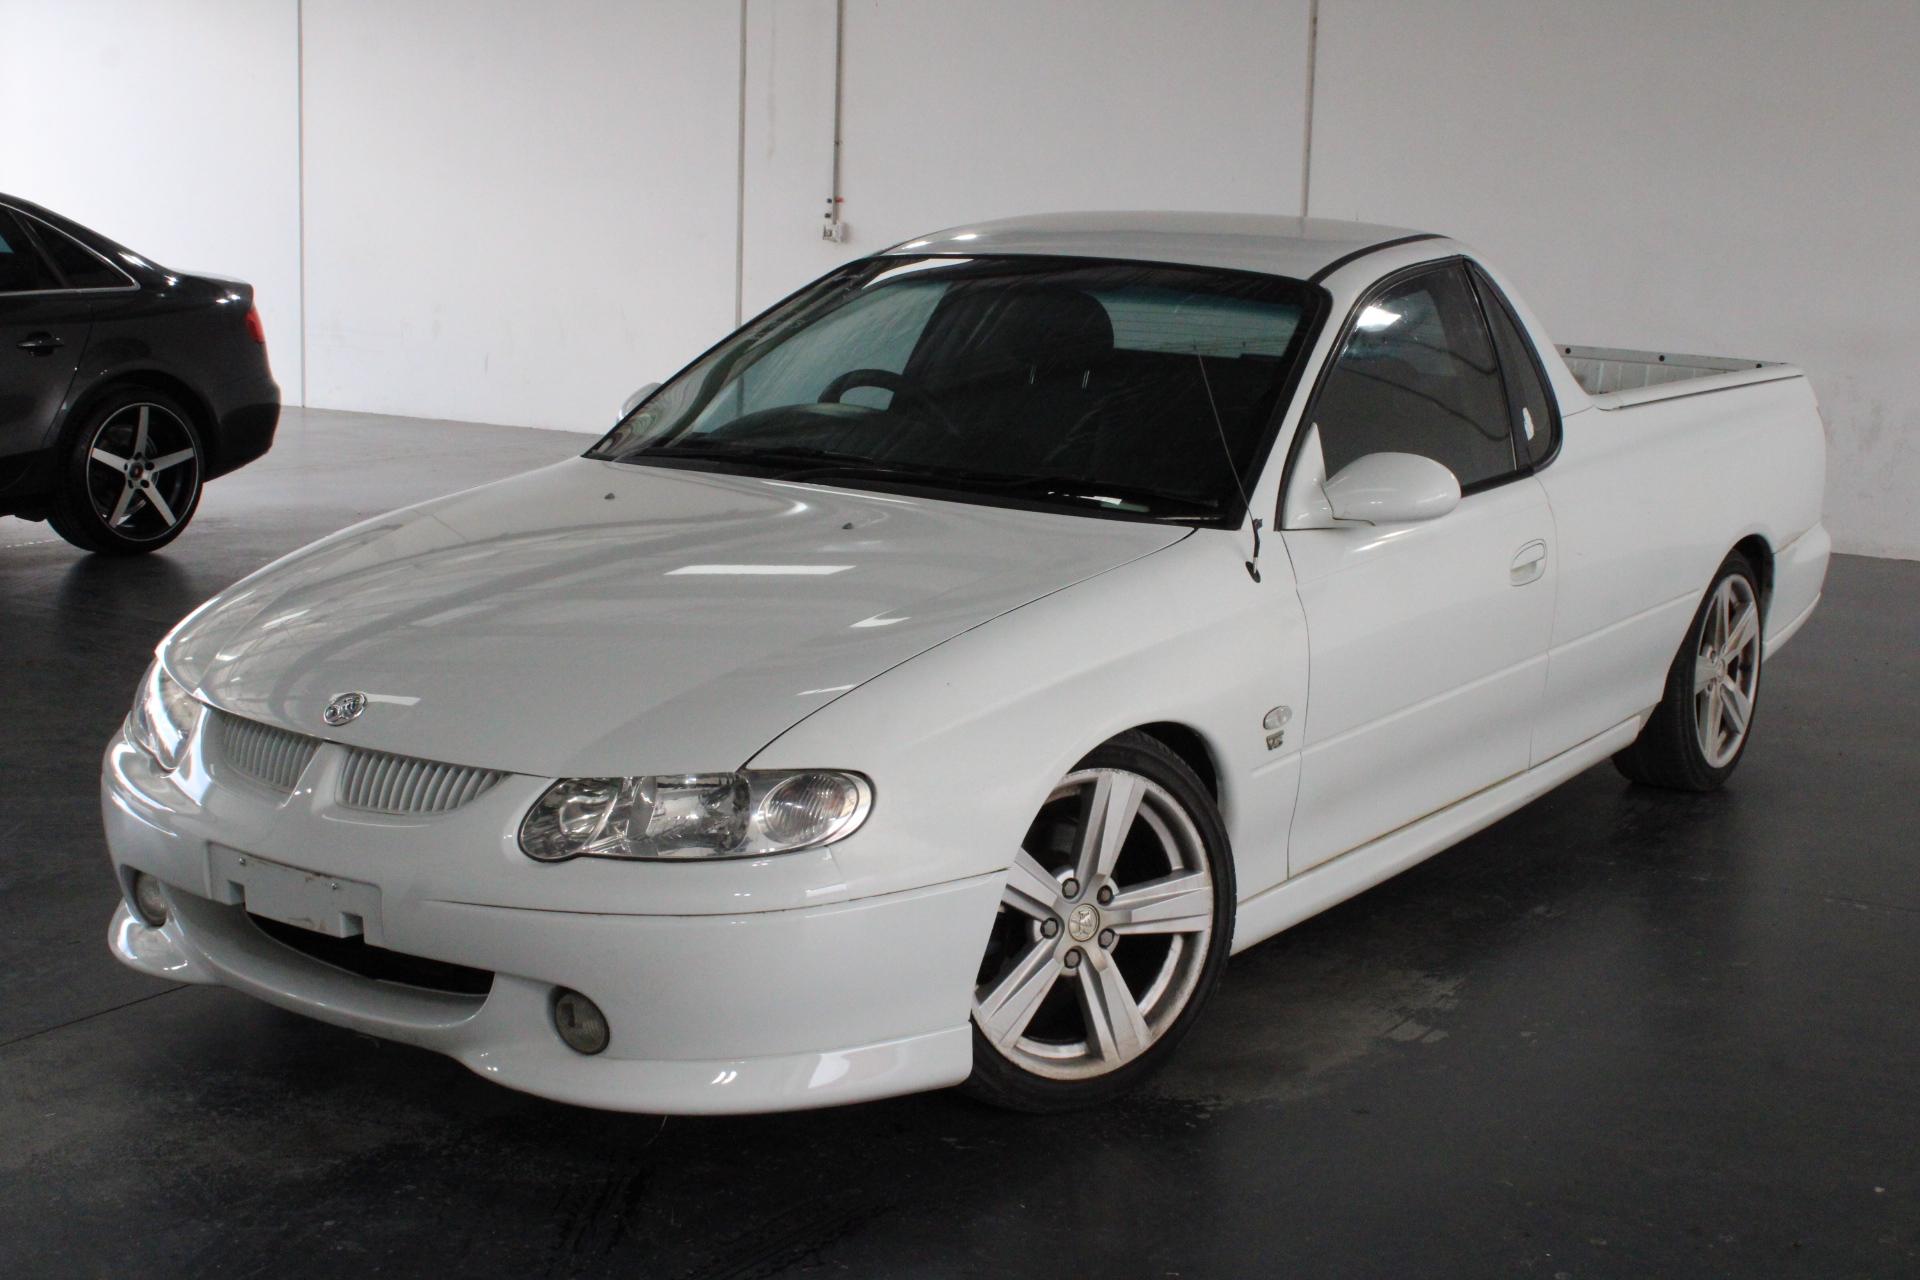 2002 Holden Commodore S VU Automatic Ute